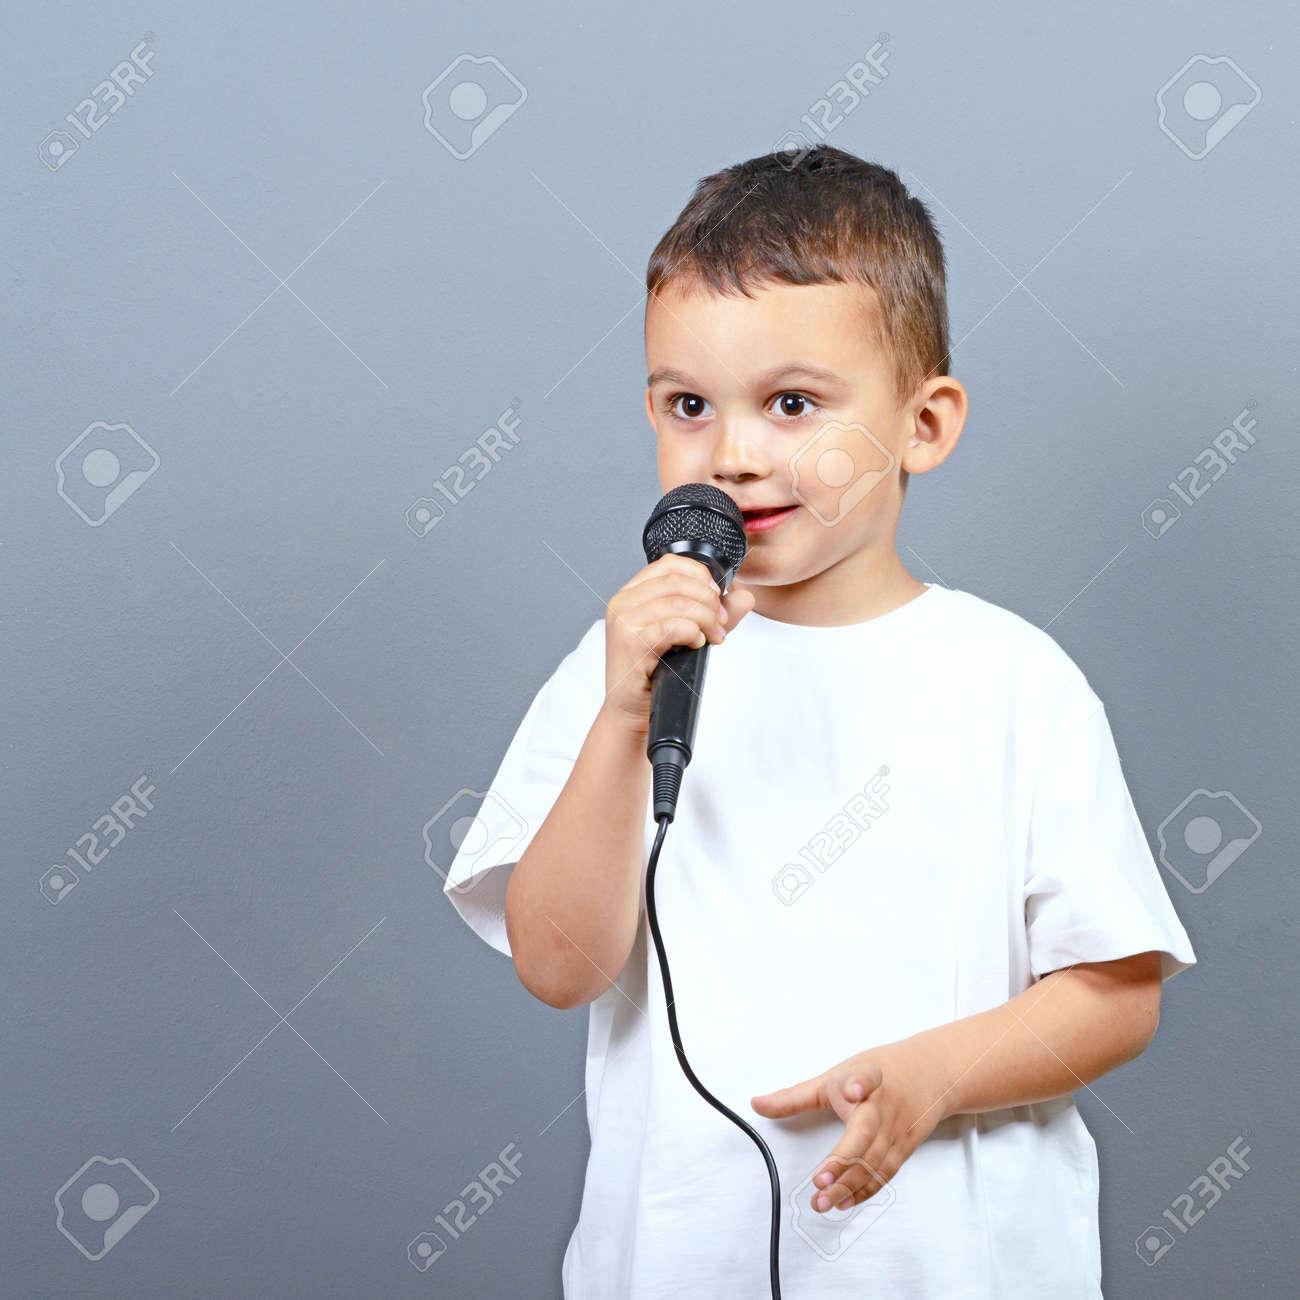 Chubby boy sings